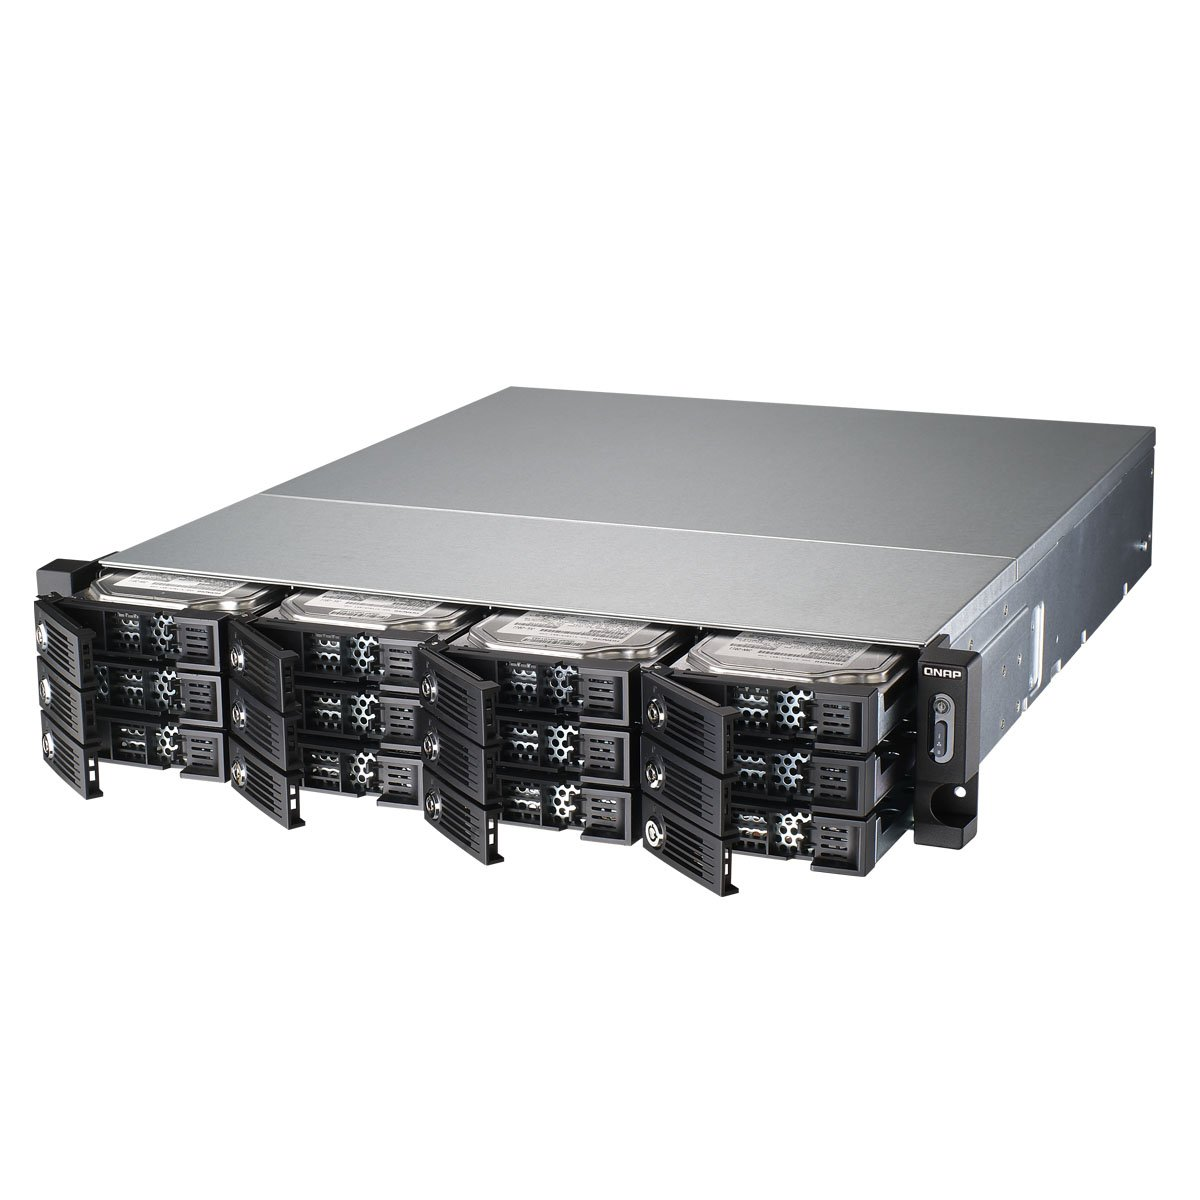 QNAP TS-1253U-RP 12-bay 2U iSCSI NAS, Intel 2.0GHz Quad Core CPU with 4GB RAM, 2.5''/3.5'' SATA 6Gb/s, Hot-swappable, Redundant PSU by QNAP (Image #2)